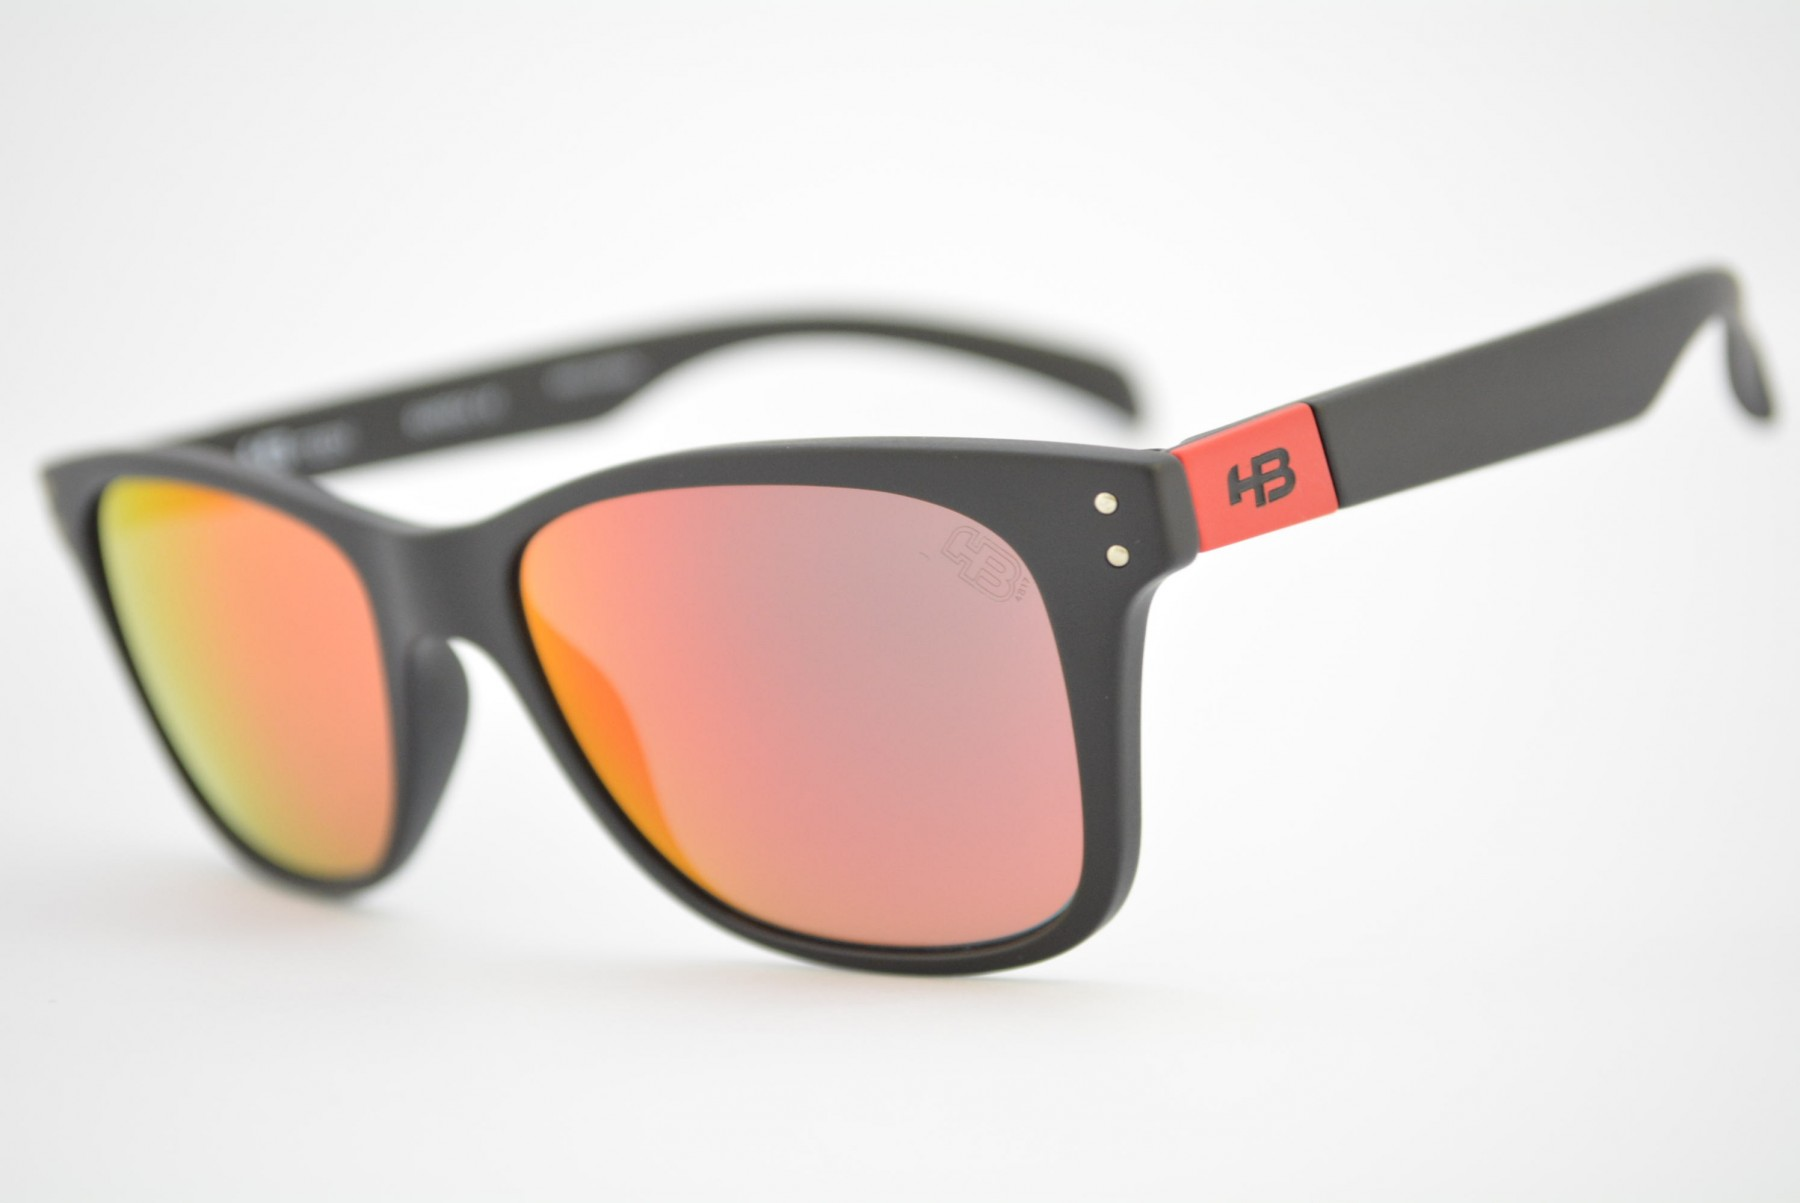 199c18fe0 Mais Imagens. óculos de sol HB teen mod land shark II 90123001